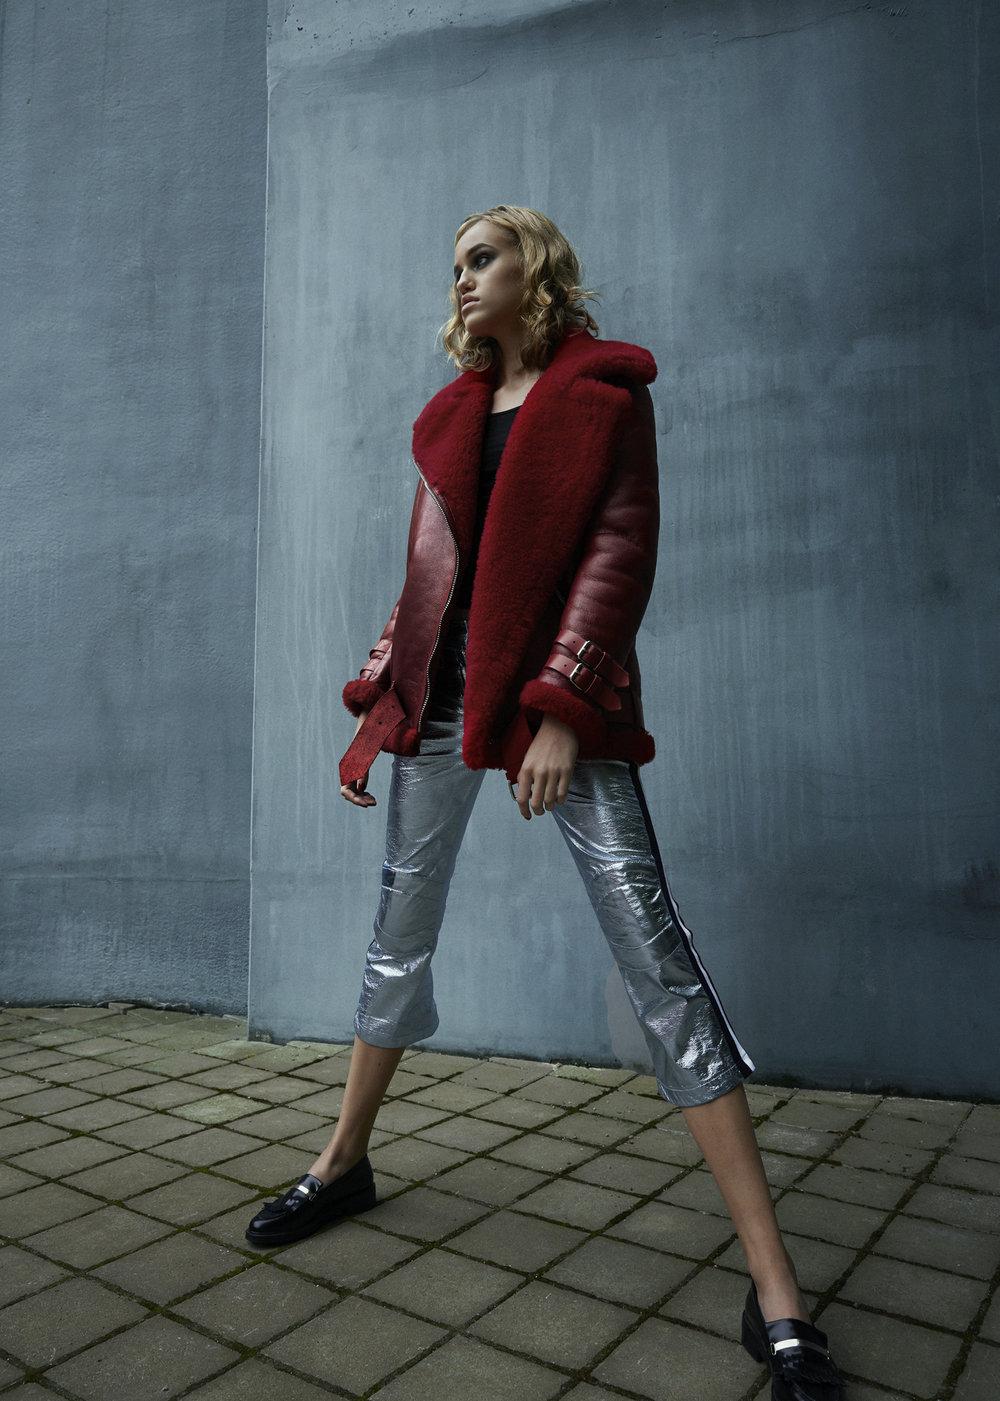 top CHLOE, jacket ACNE STUDIOS, trousers ROSSIGNOL, shoes ZALANDO